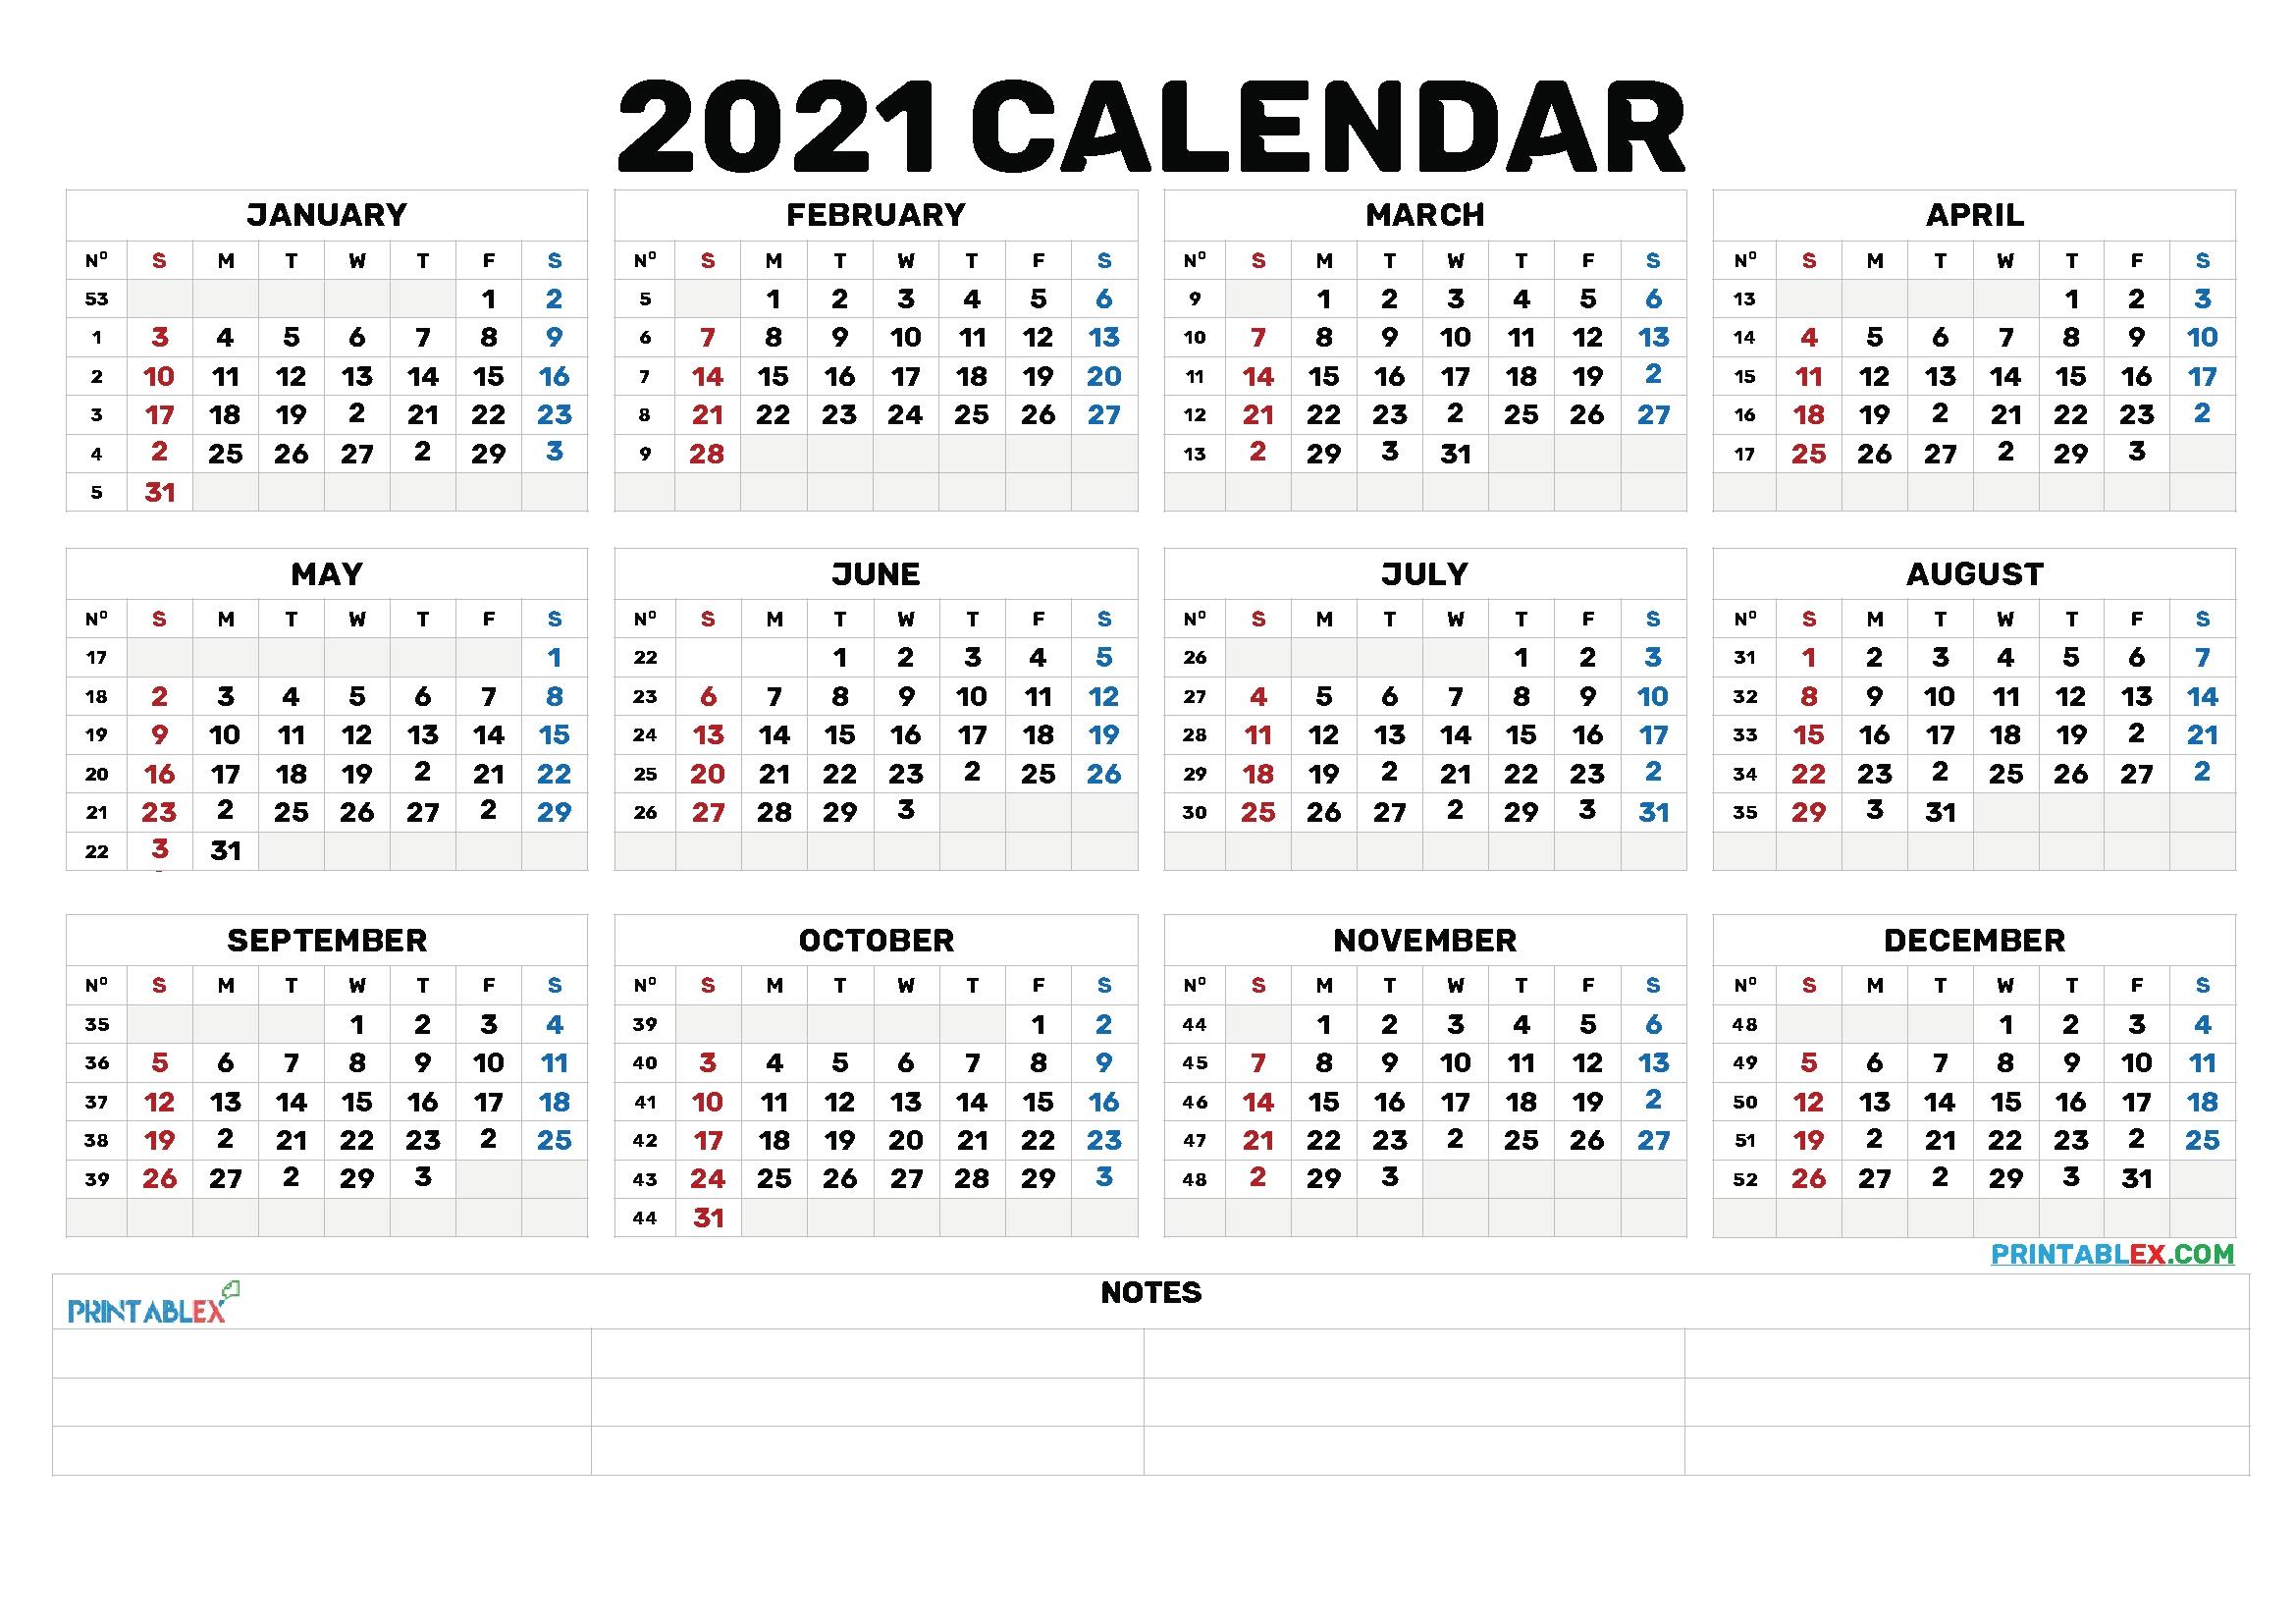 2021 Annual Calendar Printable - 21Ytw173 - Free Printable 2020 Monthly Calendar With Holidays